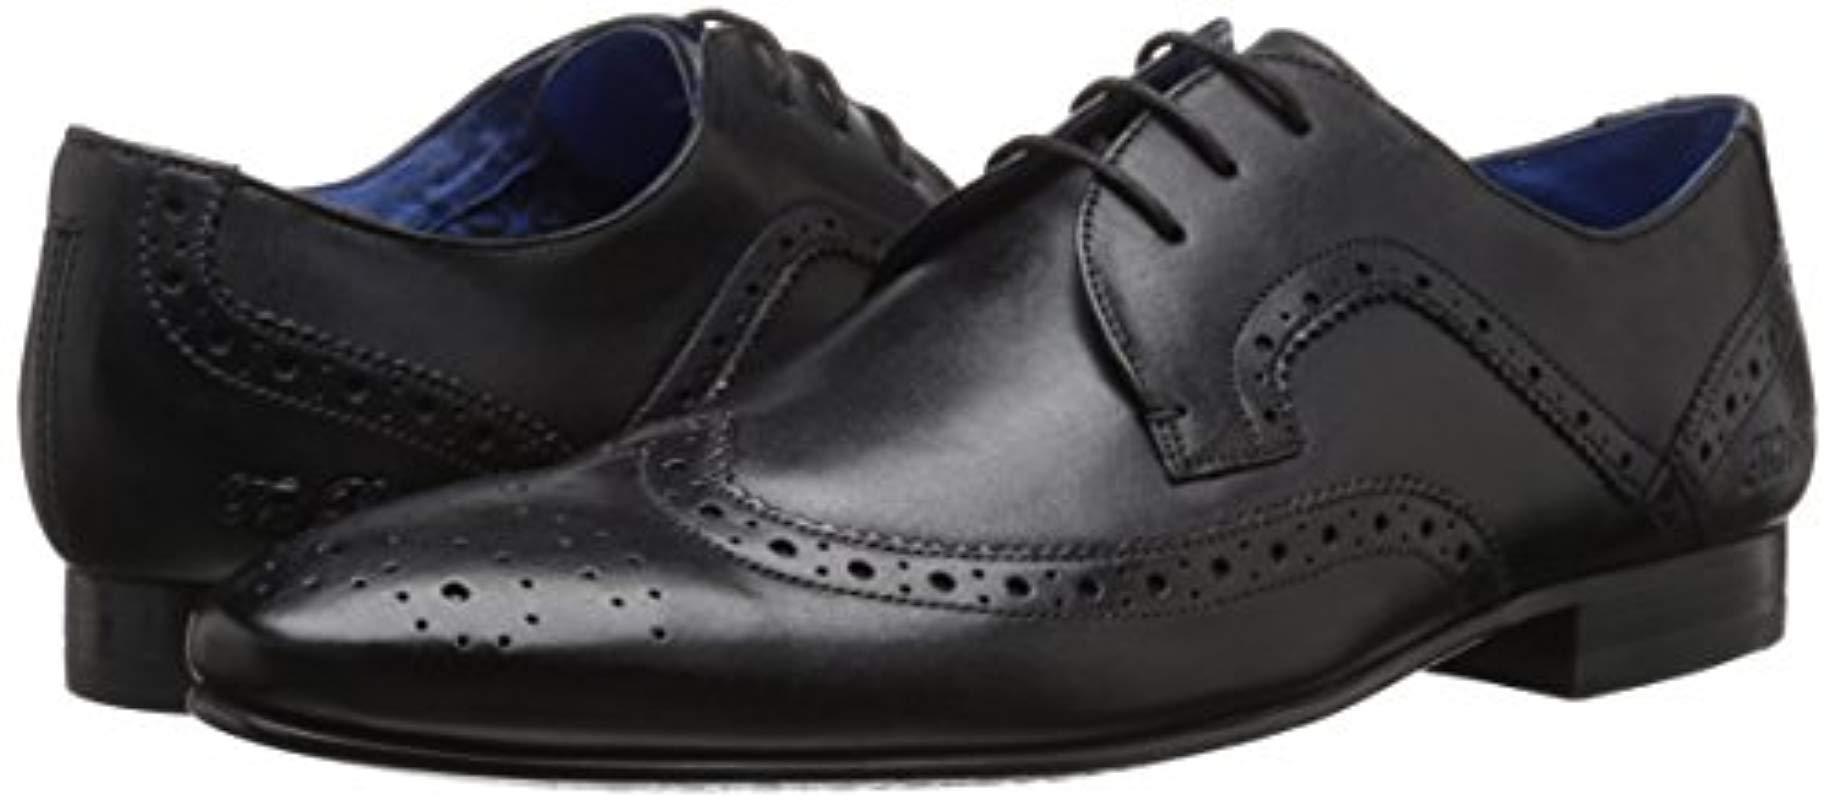 Ted Baker Mens Rovere Uniform Dress Shoe Oxfords Men